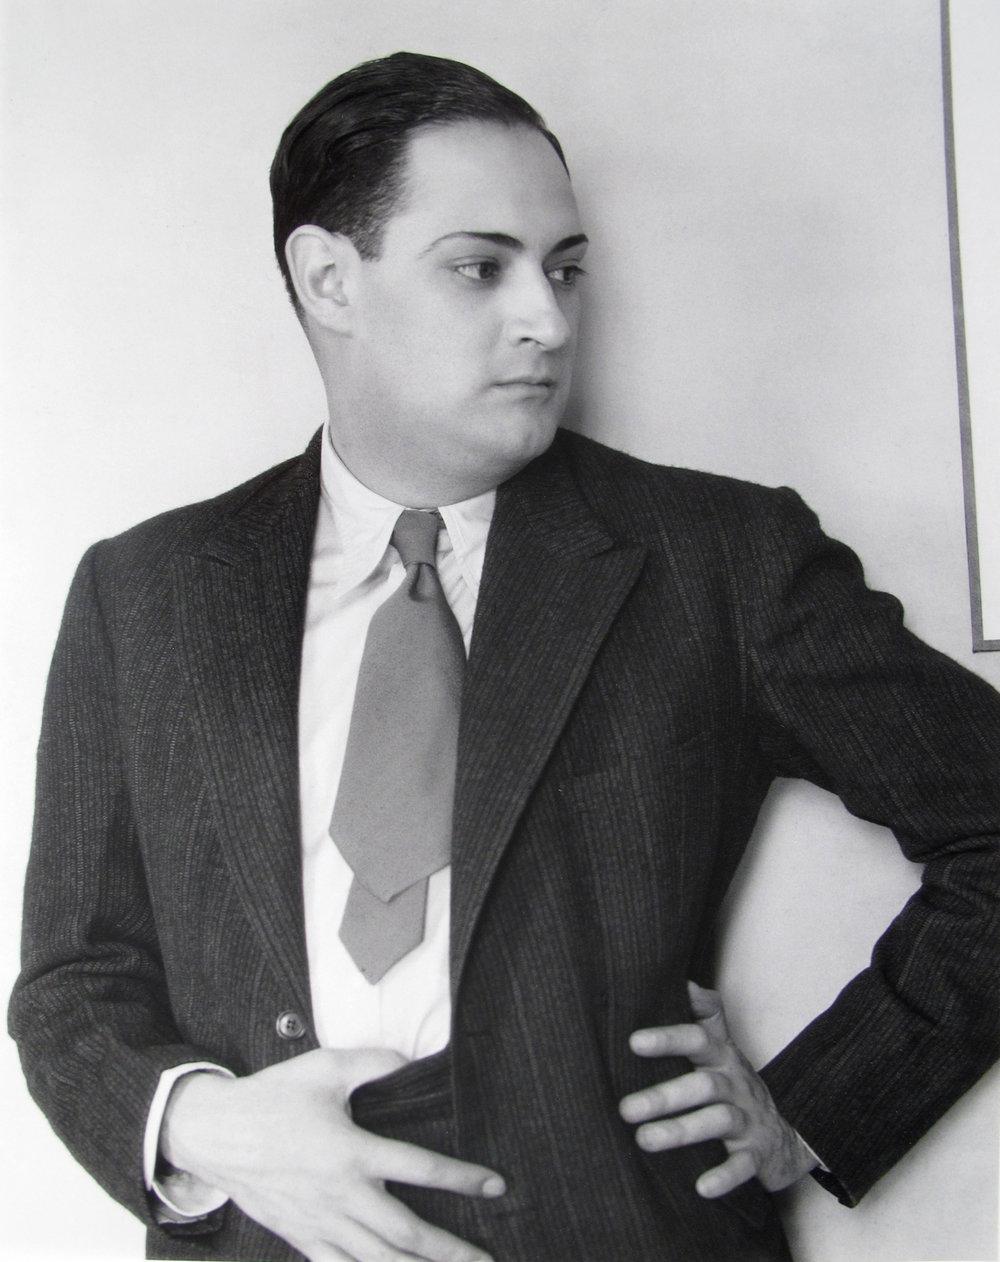 Manuel Alvarez Bravo  Salvador Novo , 1930-40 8 x 10 inches Silver Gelatin Print